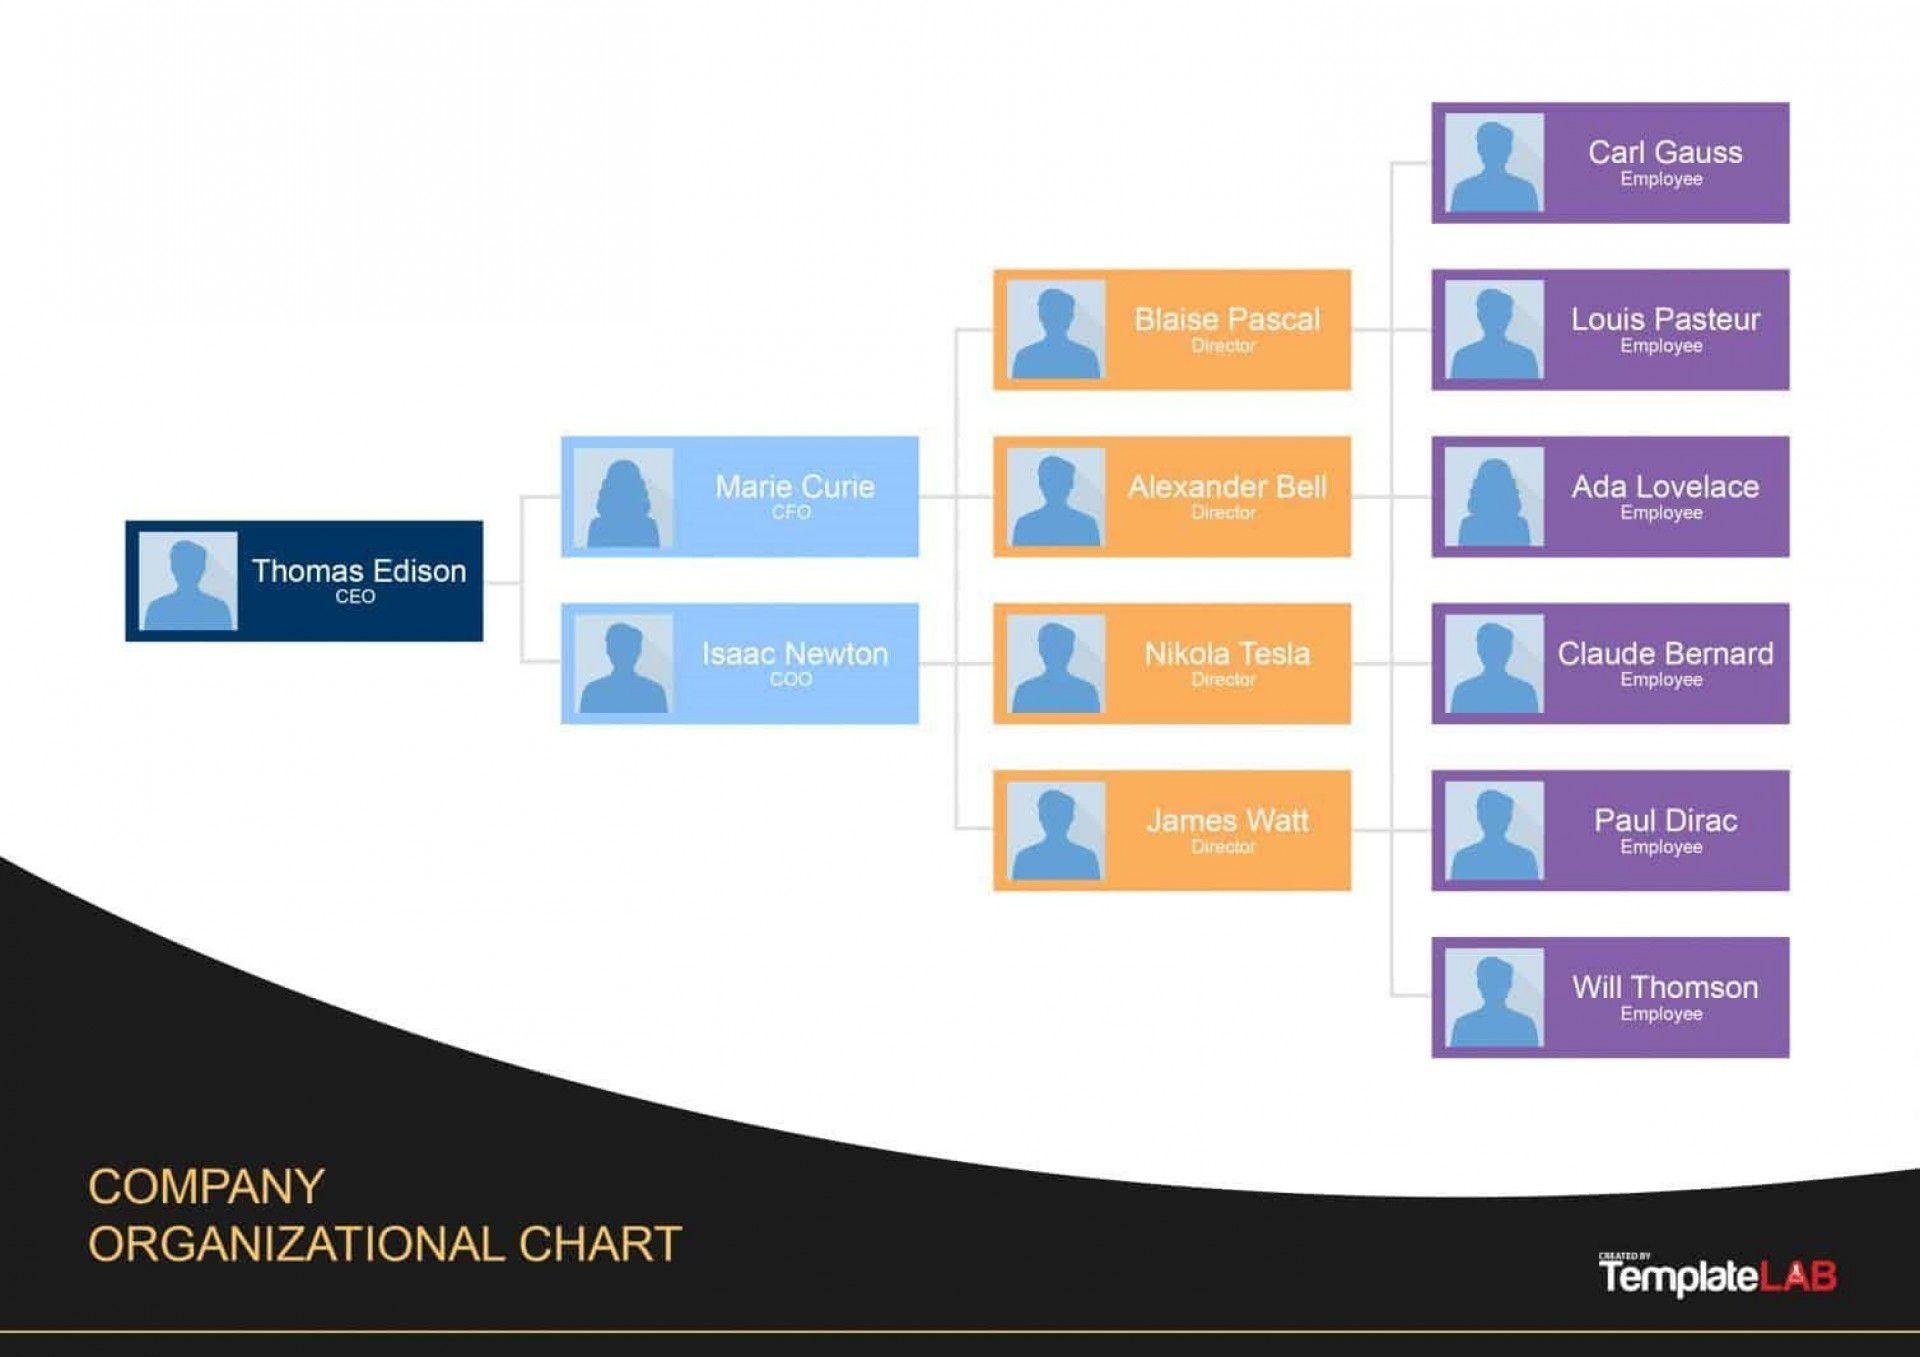 004 Frightening Microsoft Office Organizational Chart Template 2010 Inspiration 1920